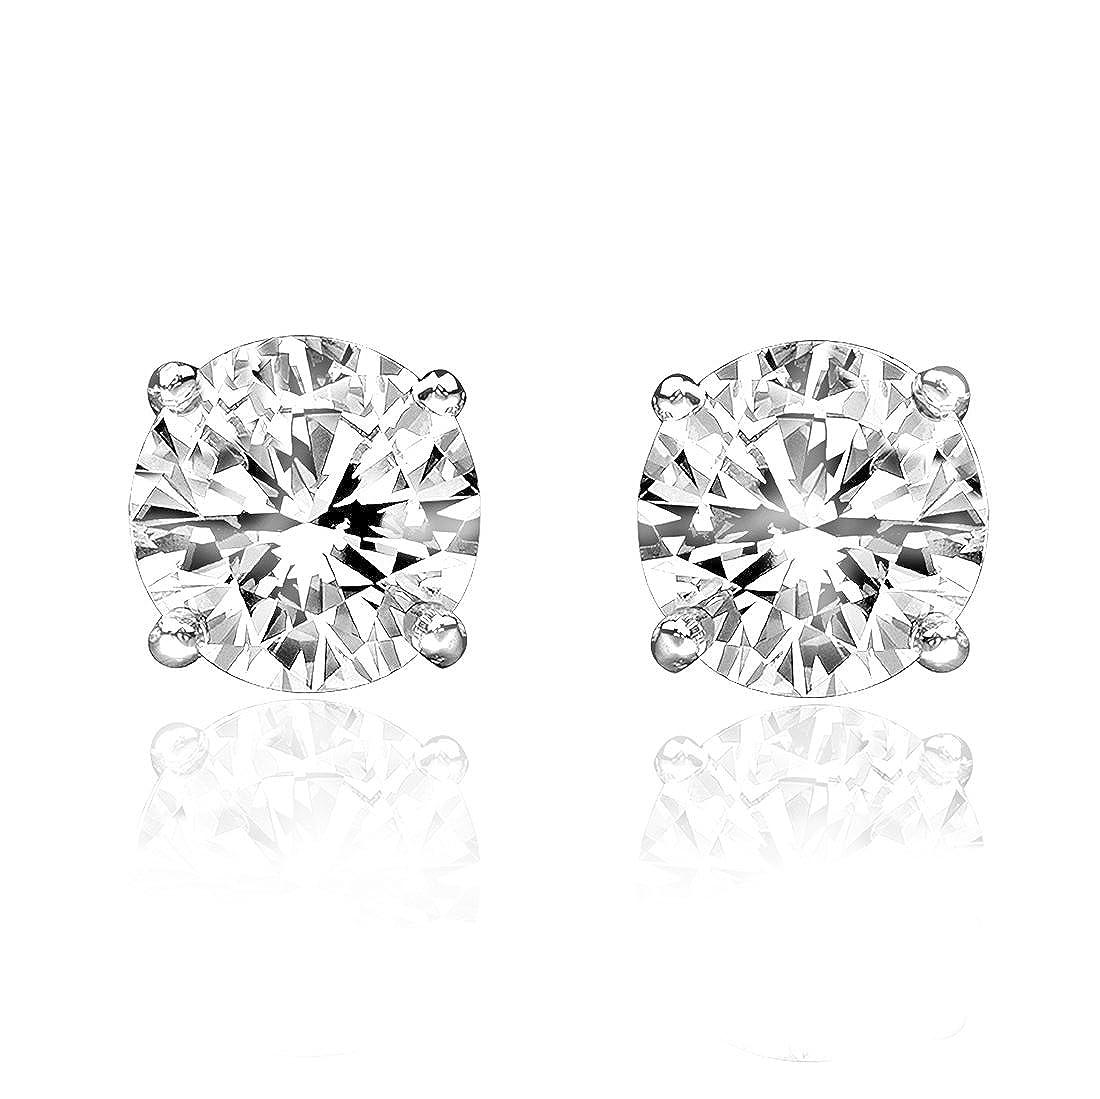 1//2ct Genuine Round Diamond 14k White Gold Stud Earrings Screw Backs Samaya Jewels